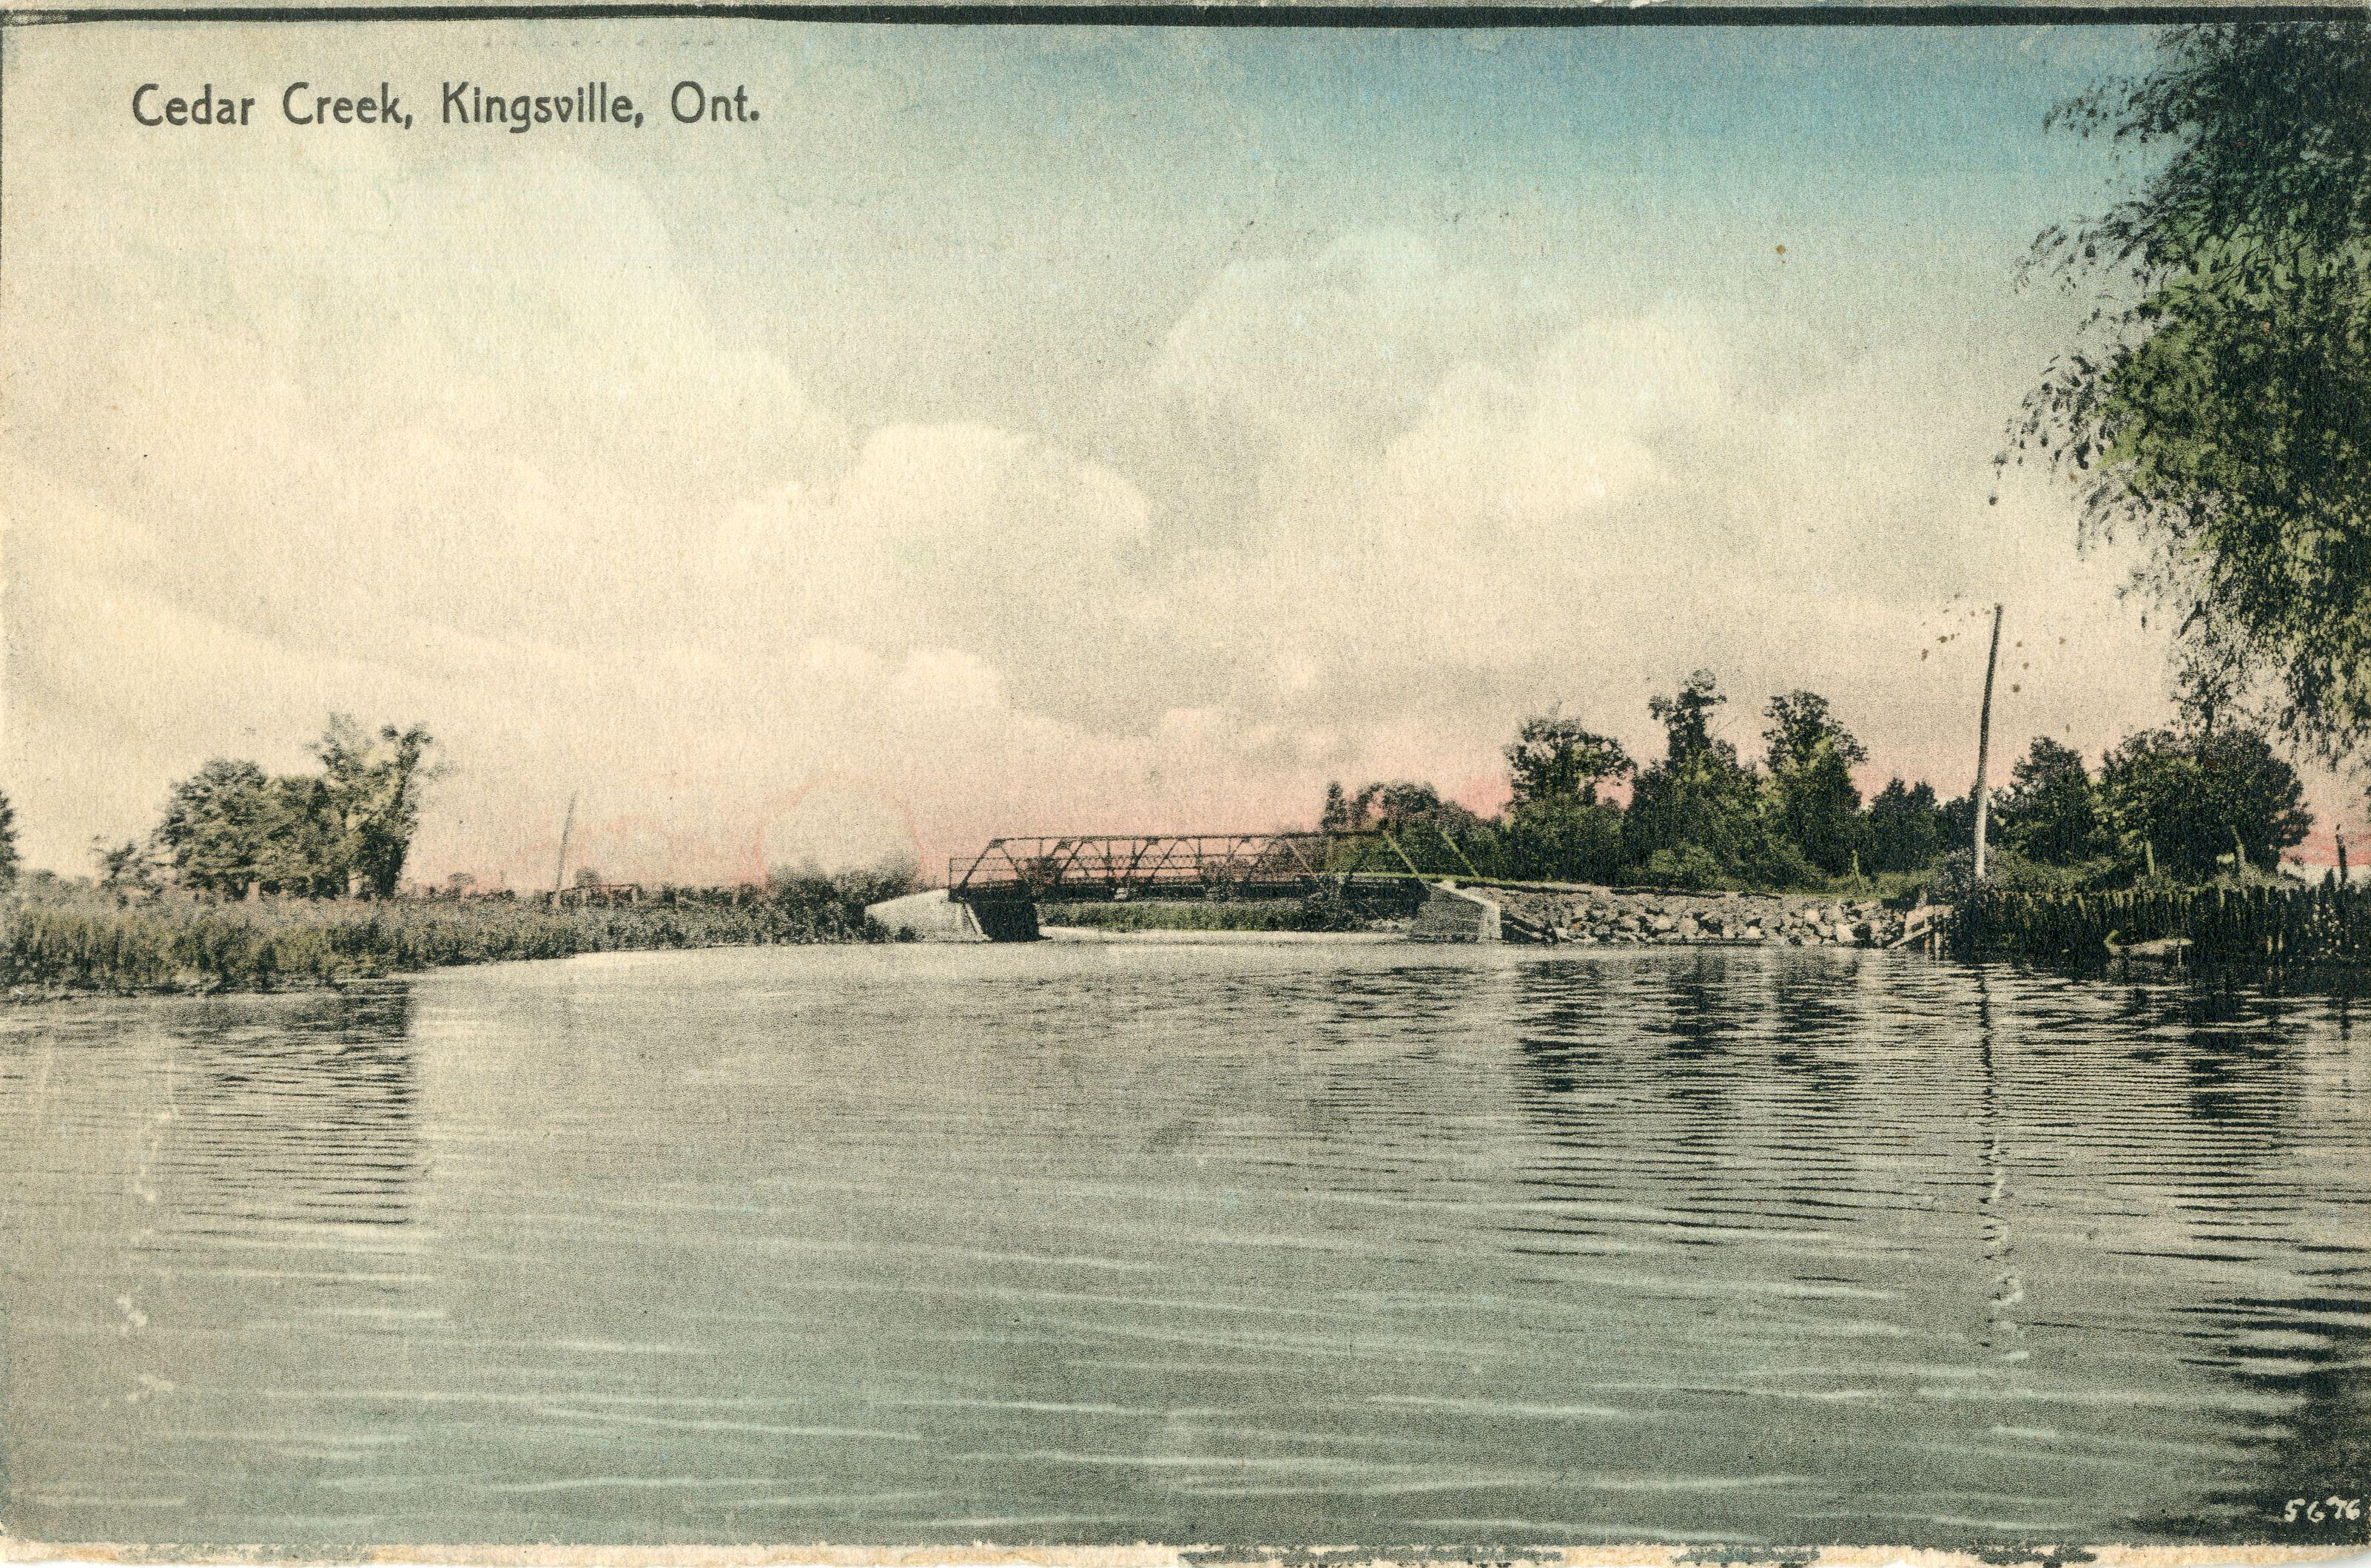 Cedar Creek Kingsville Ont Southwestern Ontario